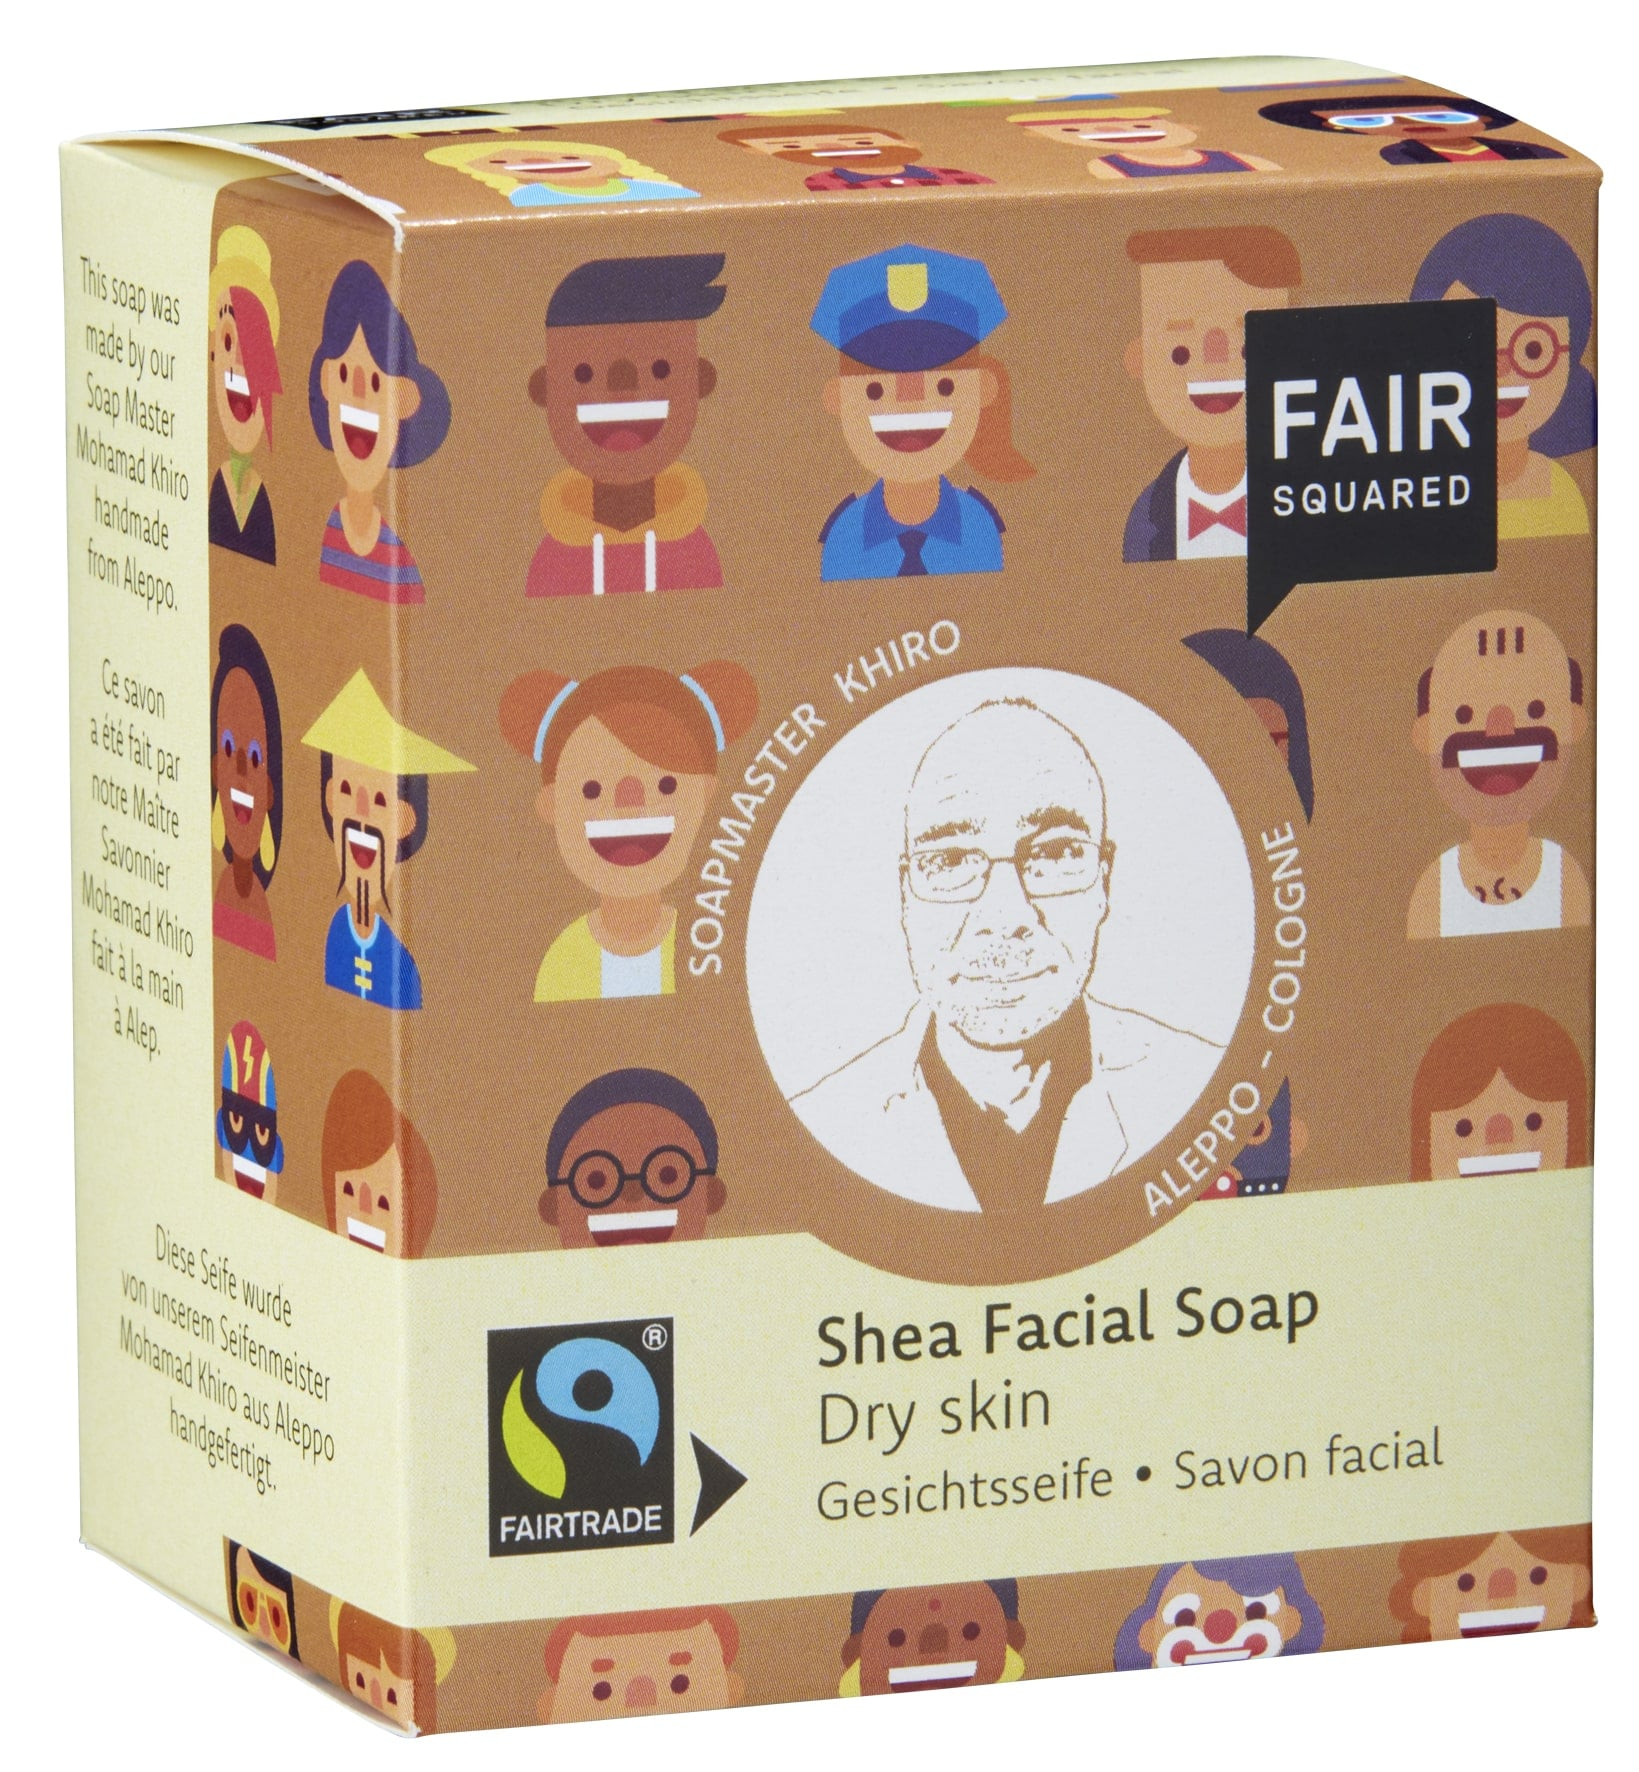 Shea Facial Soap Dry Skin